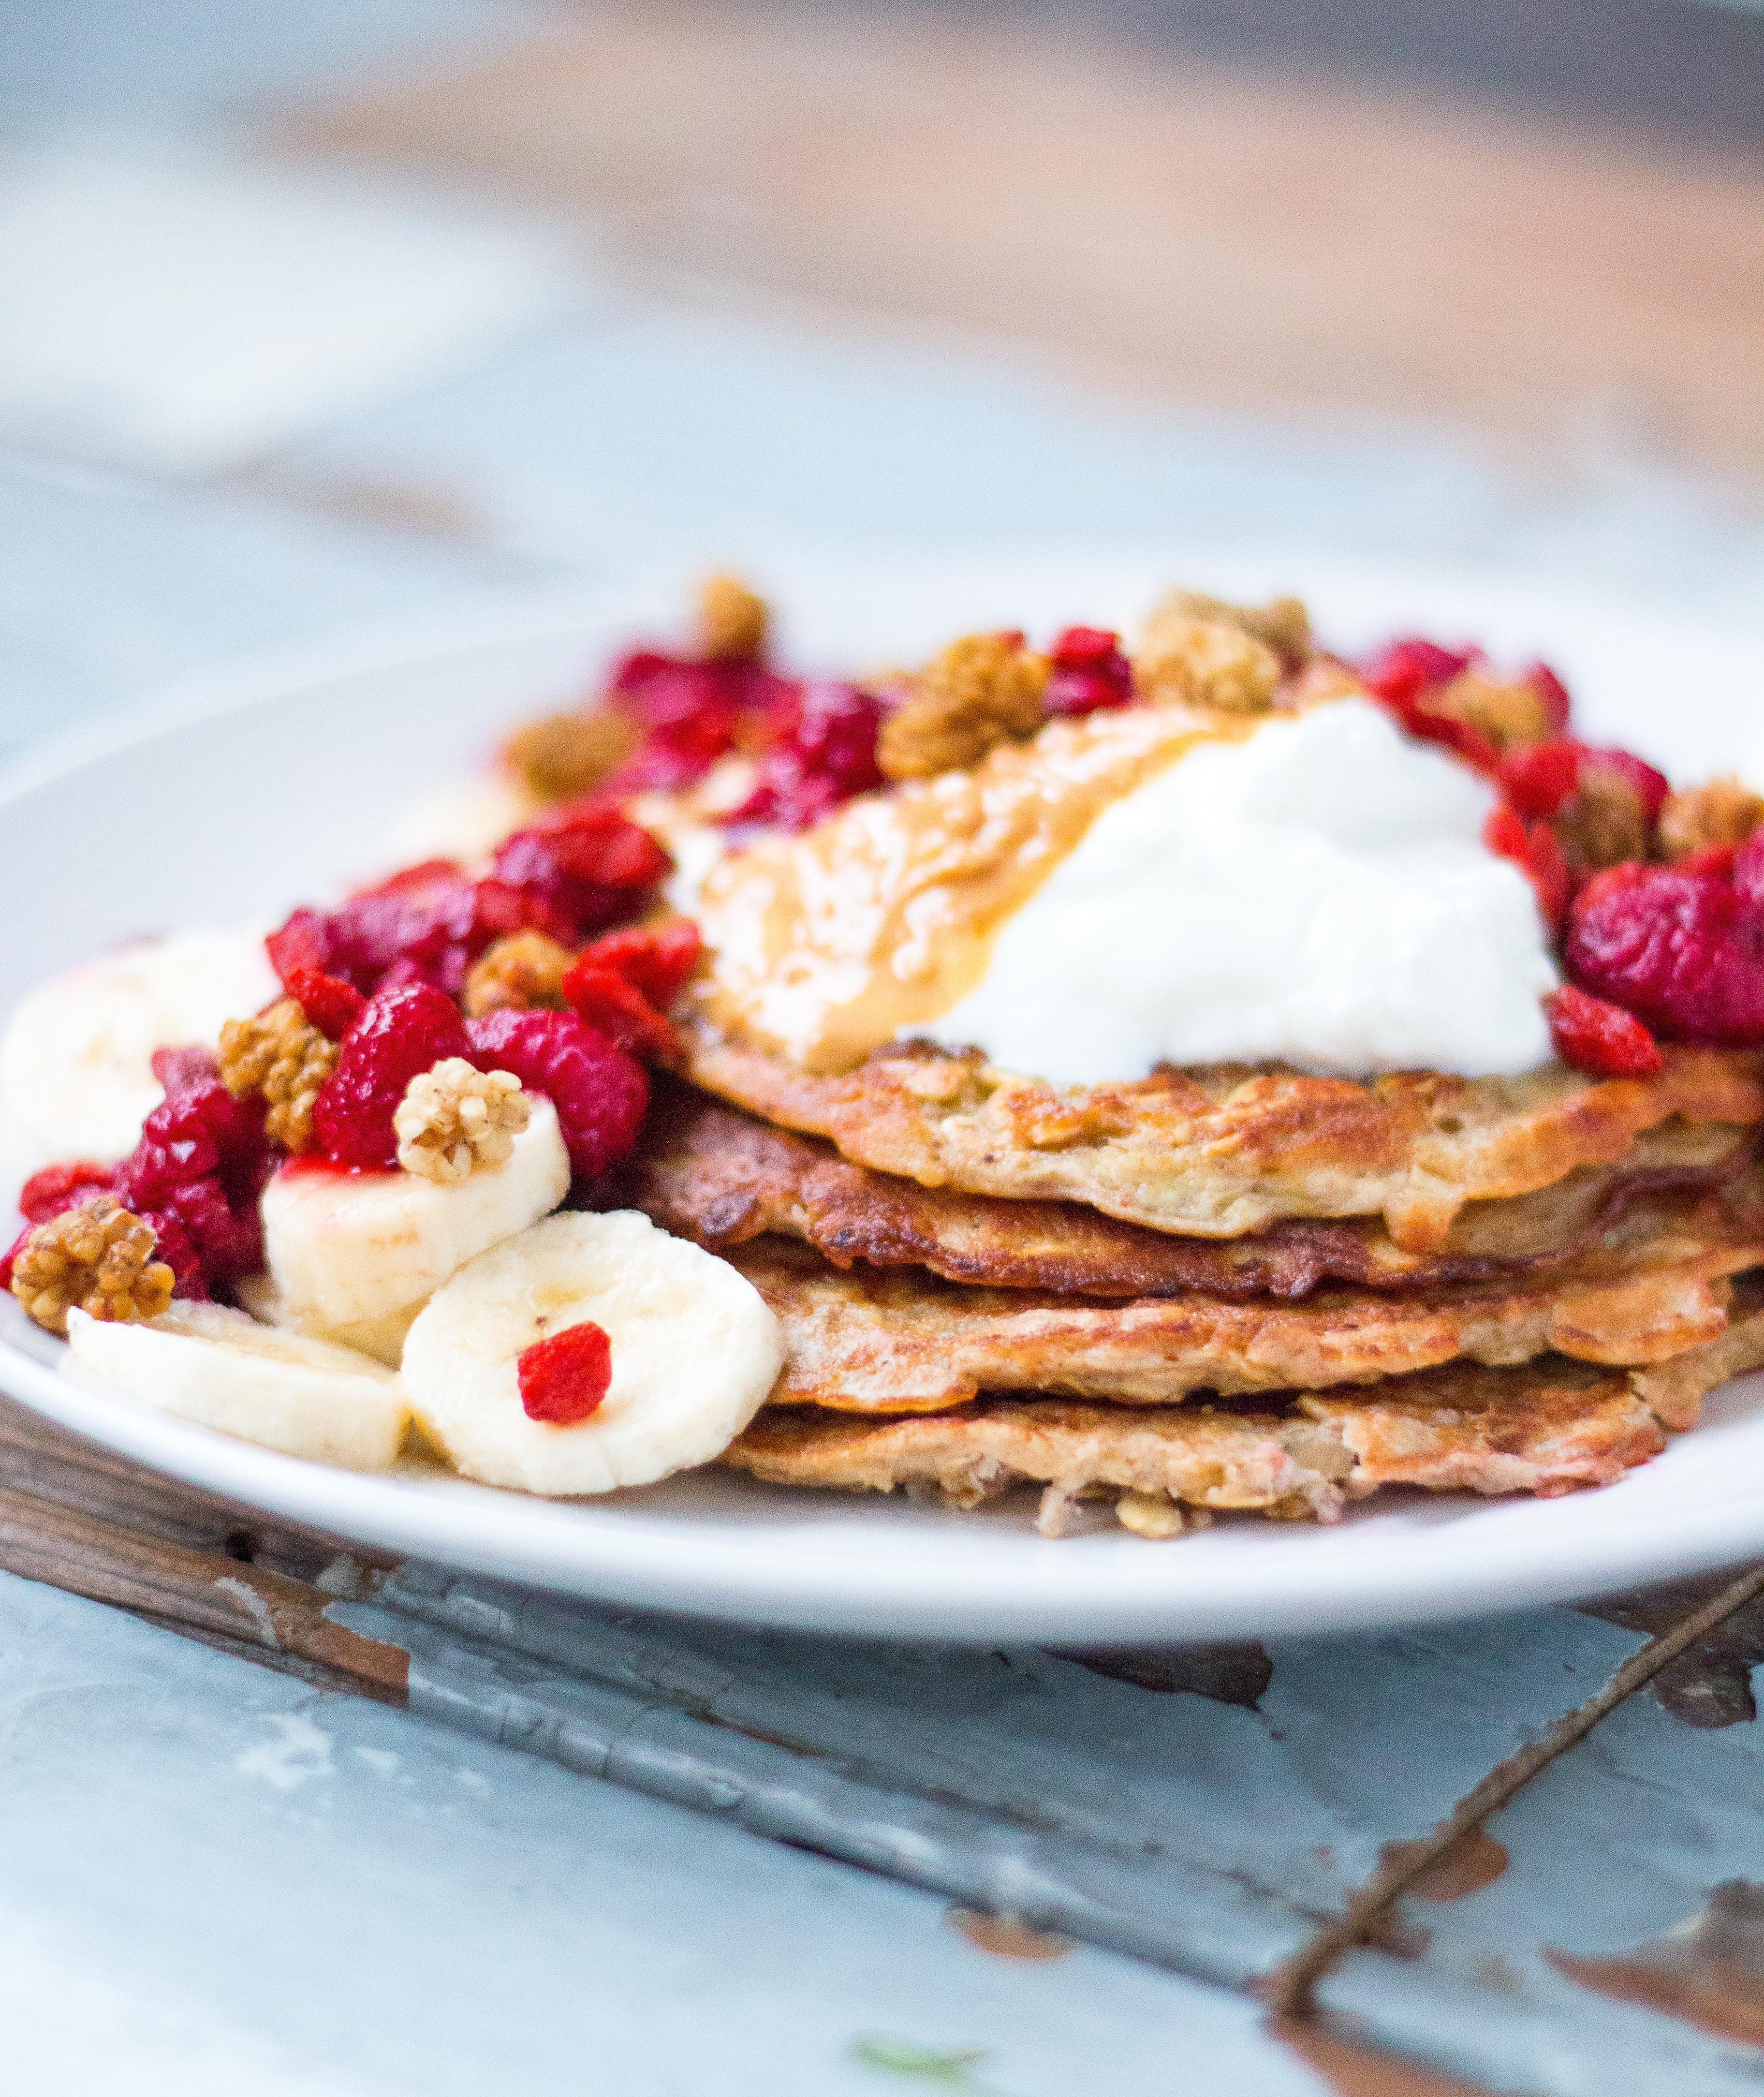 Banana Peanutbutter Pancakes // Rosalie Ruardy